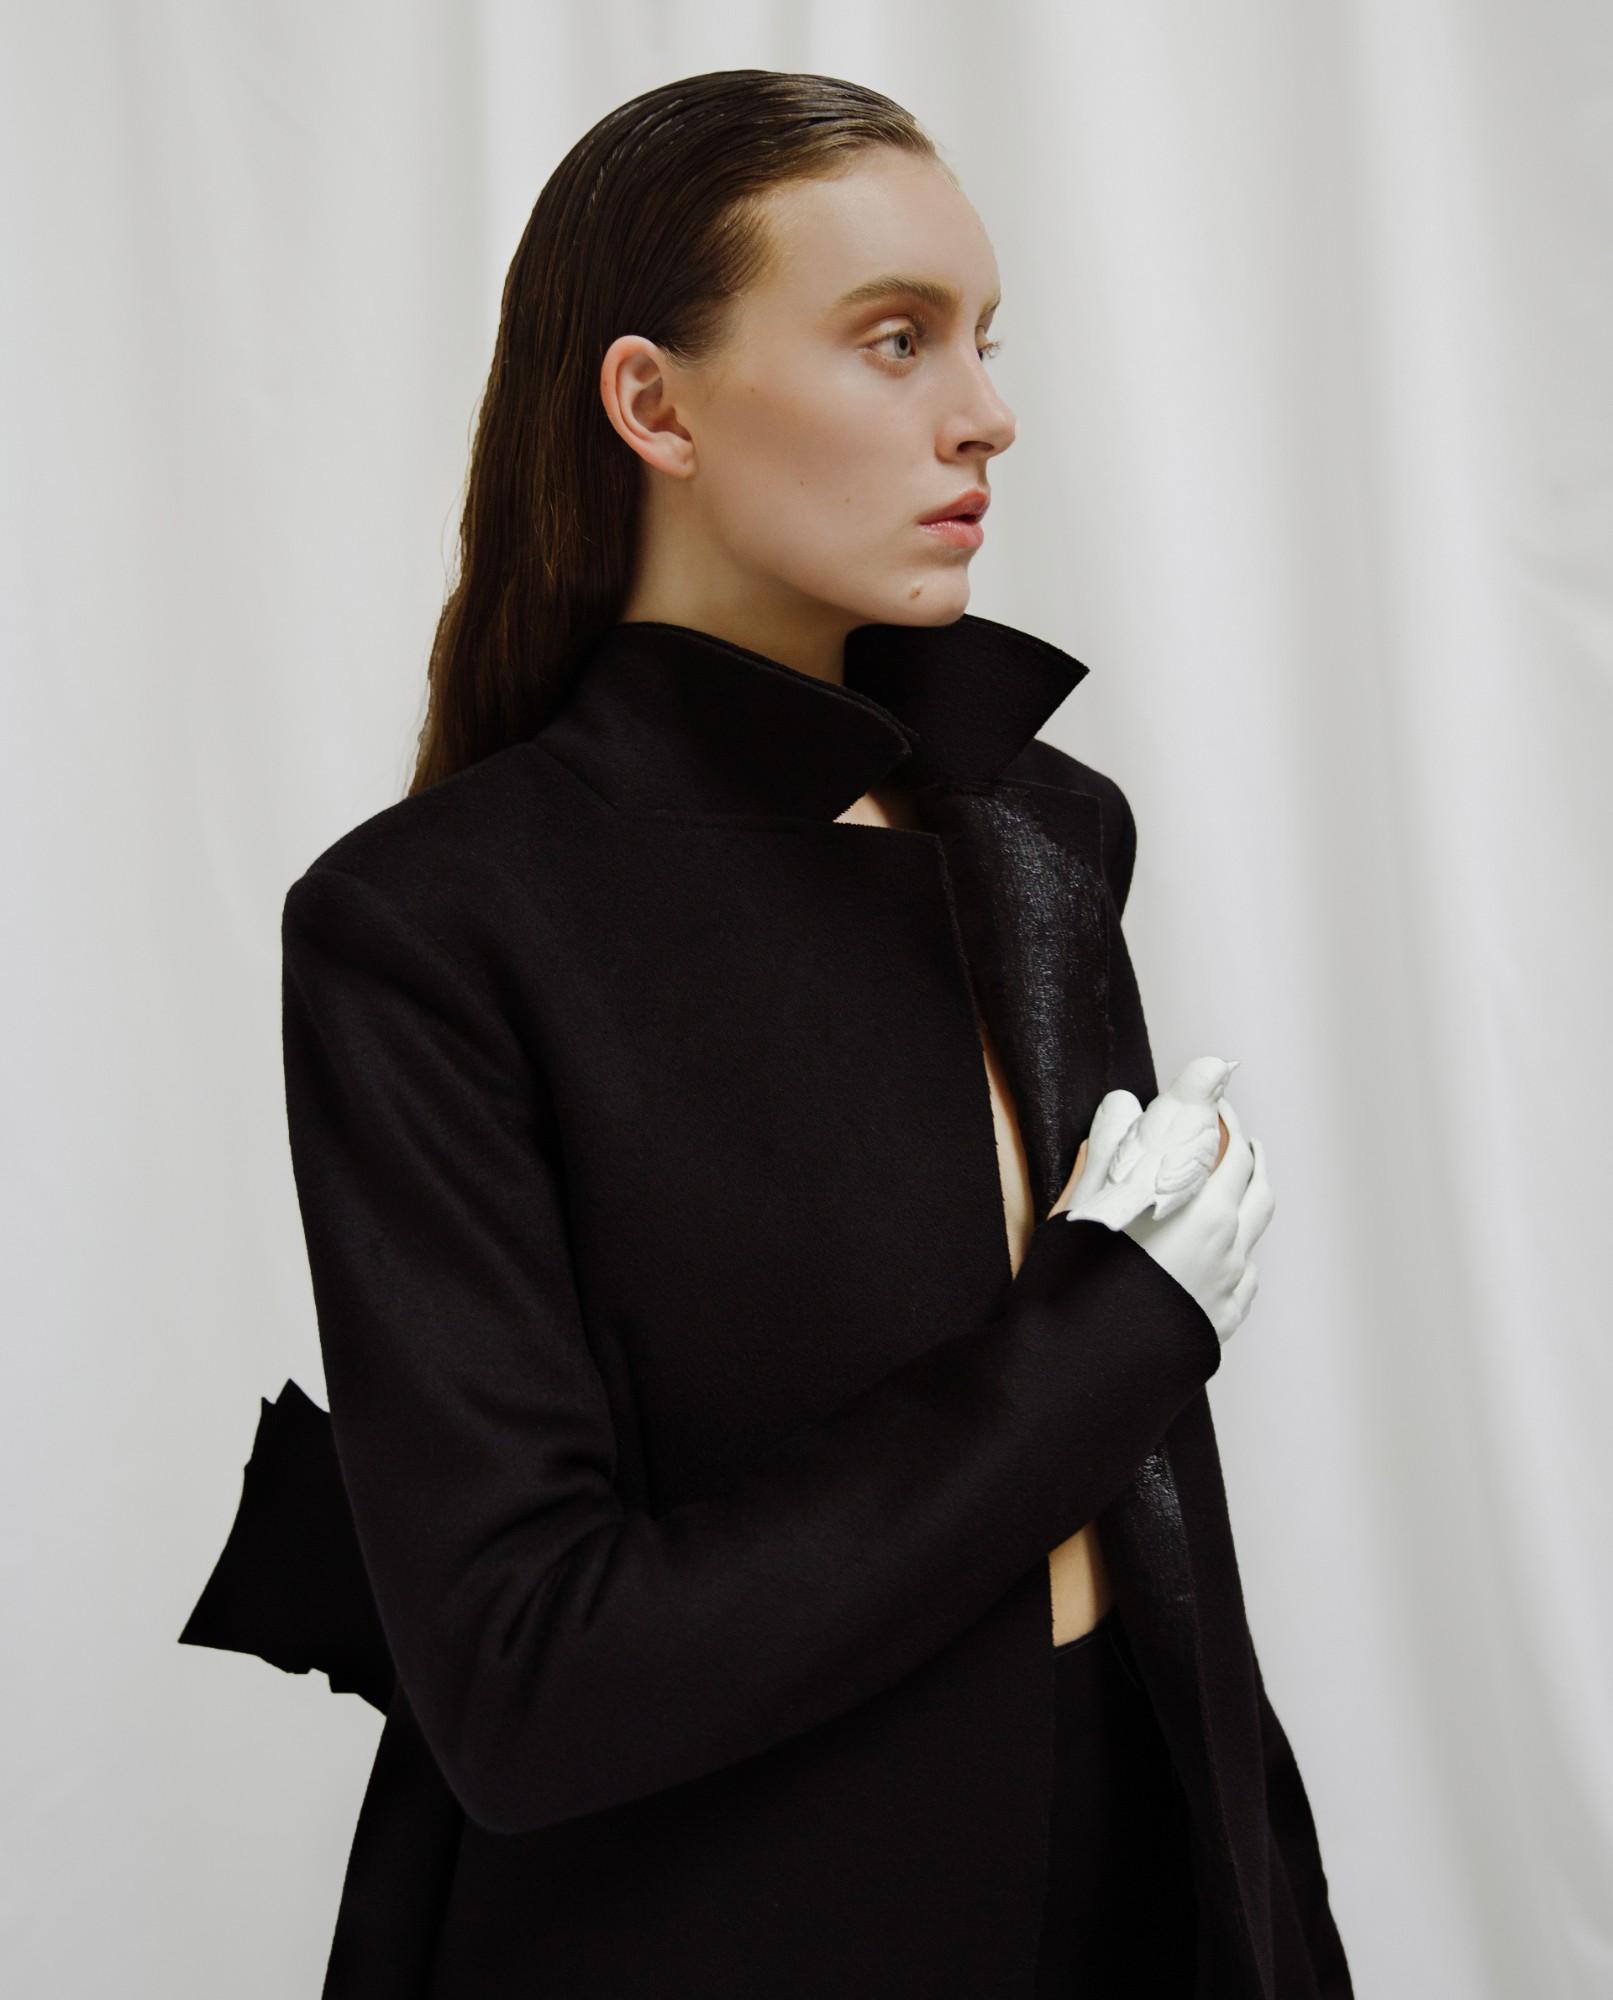 Vulnus Cura, Yvonne Lin, designer | photography Anna Sting,17_